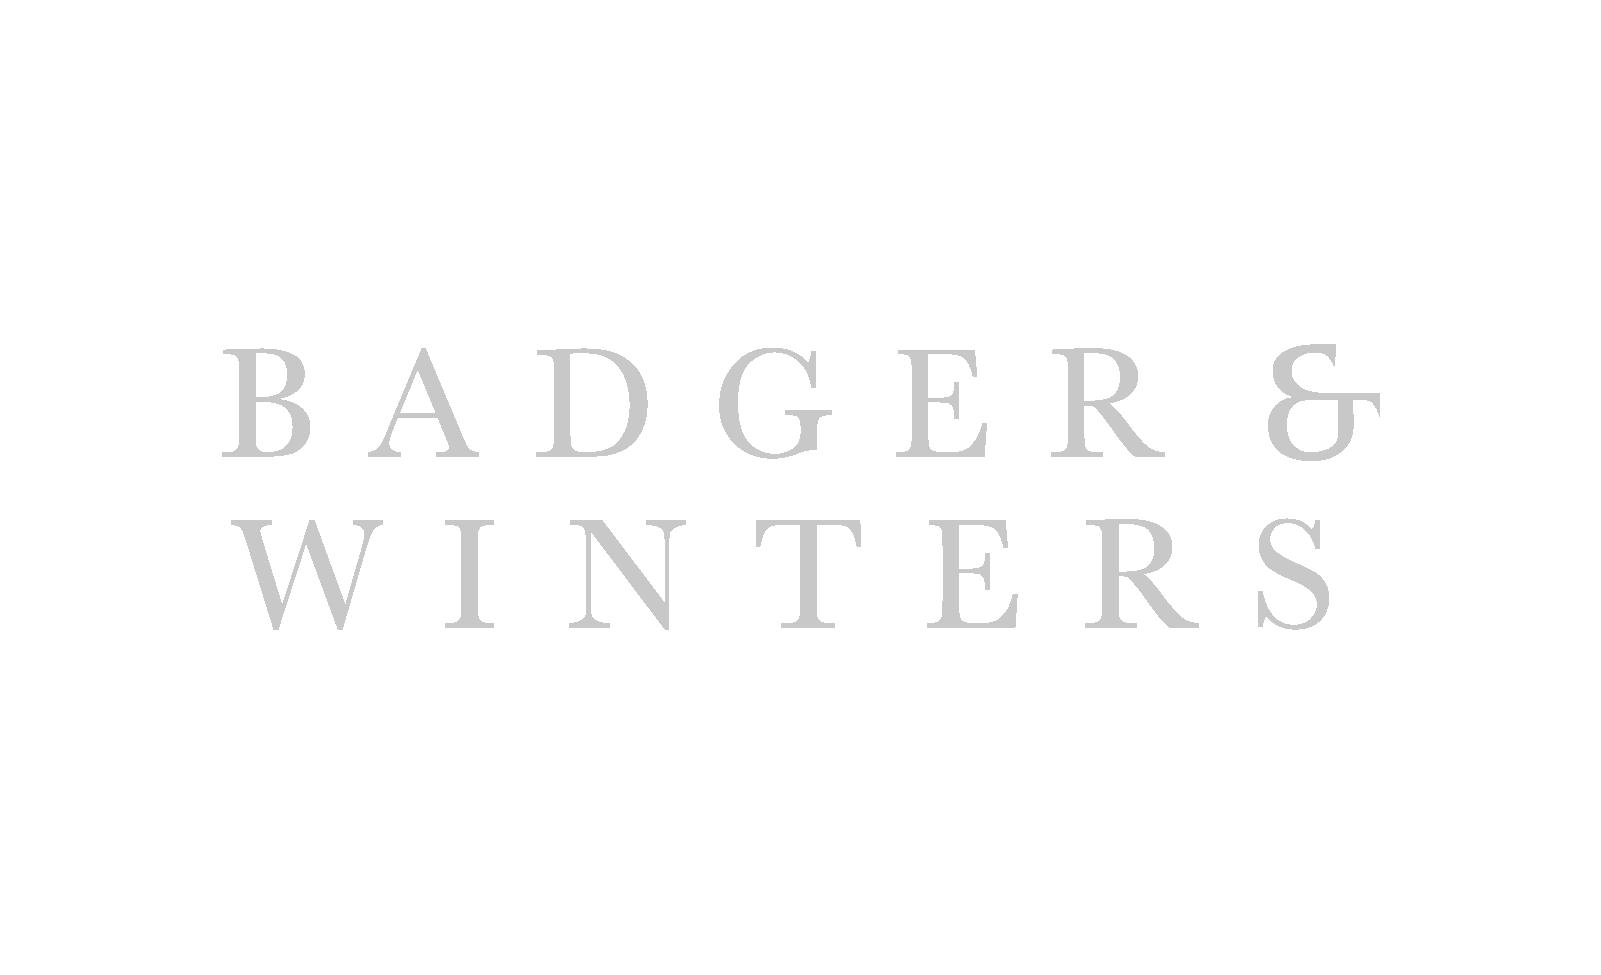 BadgersWinters.png